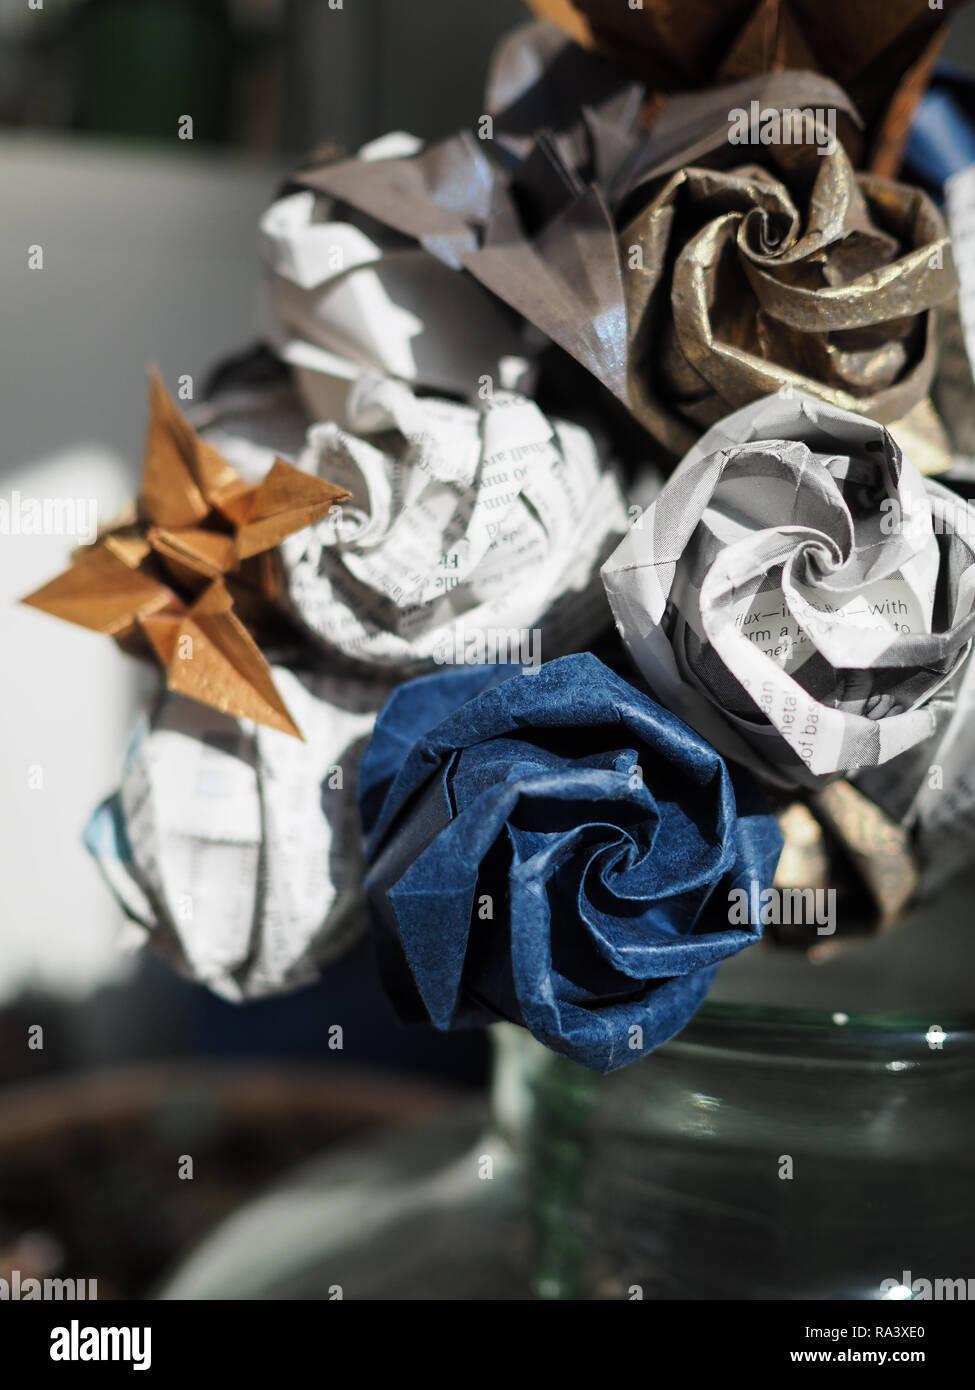 Paper Kusudama Origami Rose Flower Wedding Bouquet by PawsDesigns ... | 1390x974